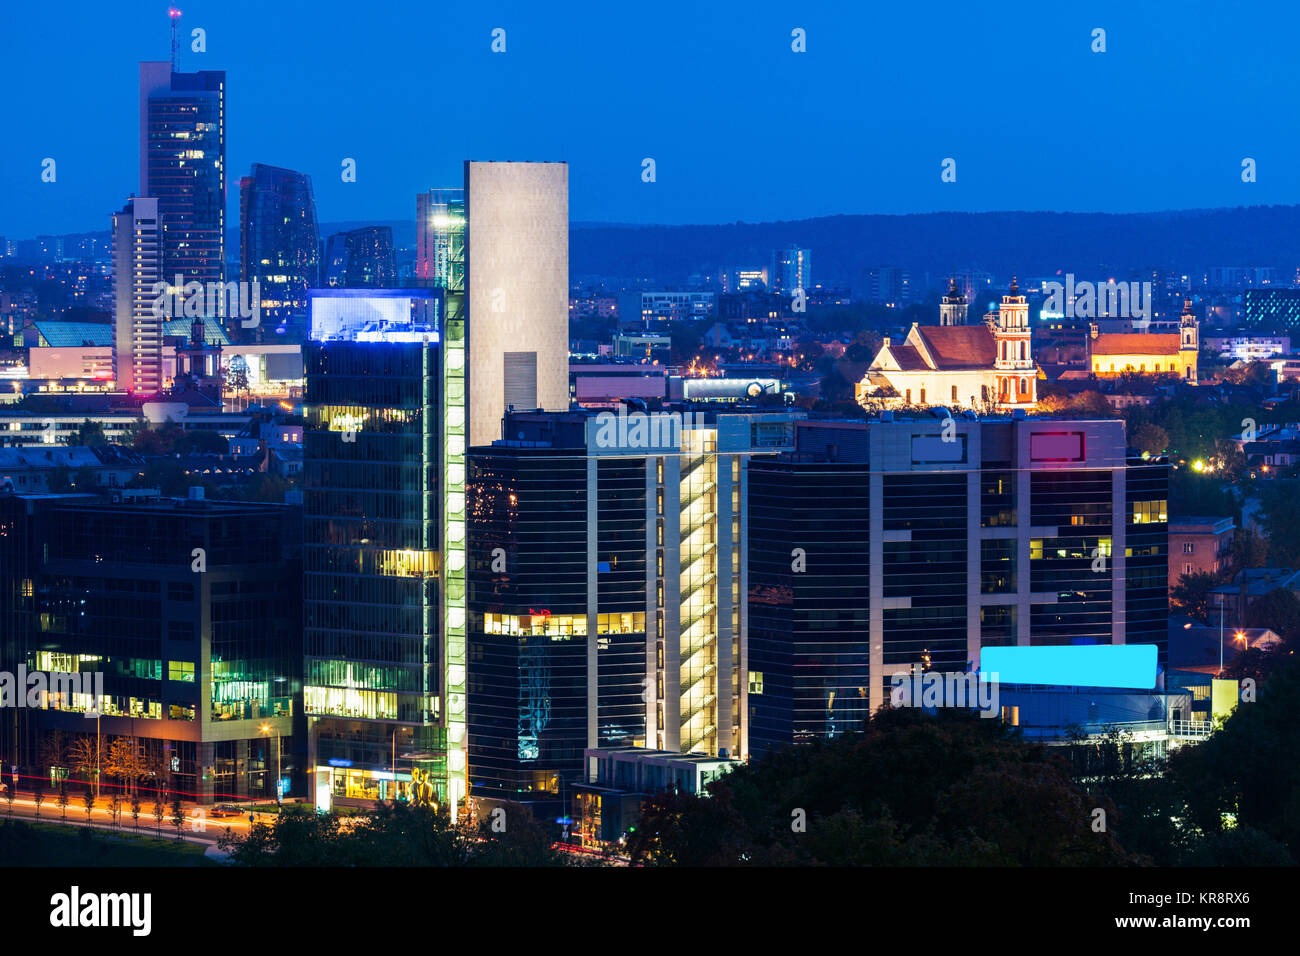 Litauen, Vilnius, Stadtbild bei Nacht Stockbild